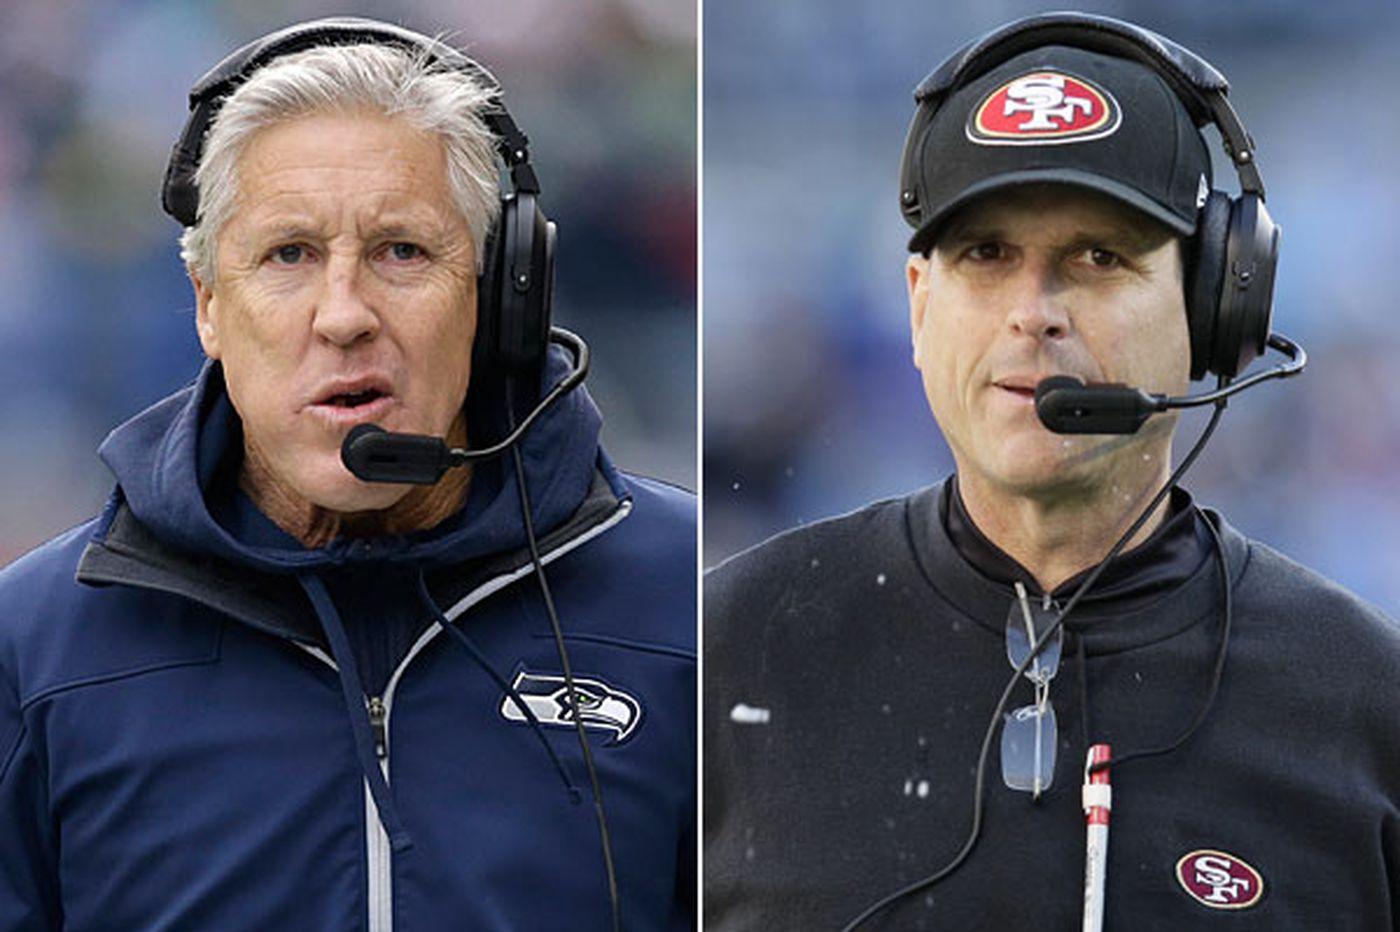 Carroll vs. Harbaugh: An entertaining rivalry